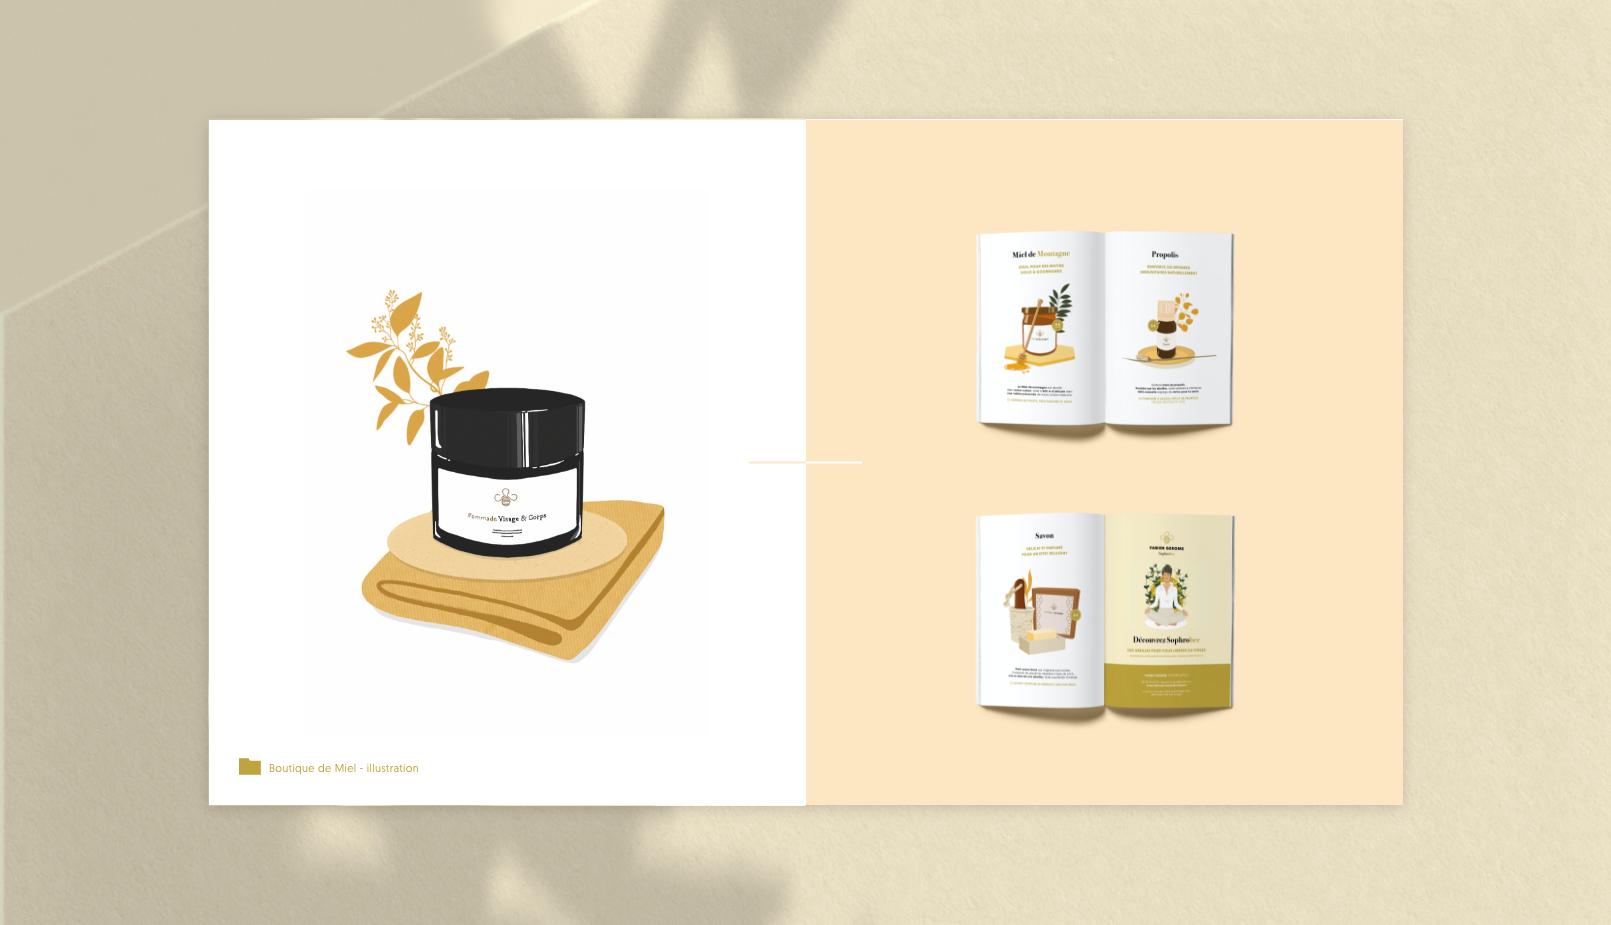 marion-carlier-services-boutique-miel